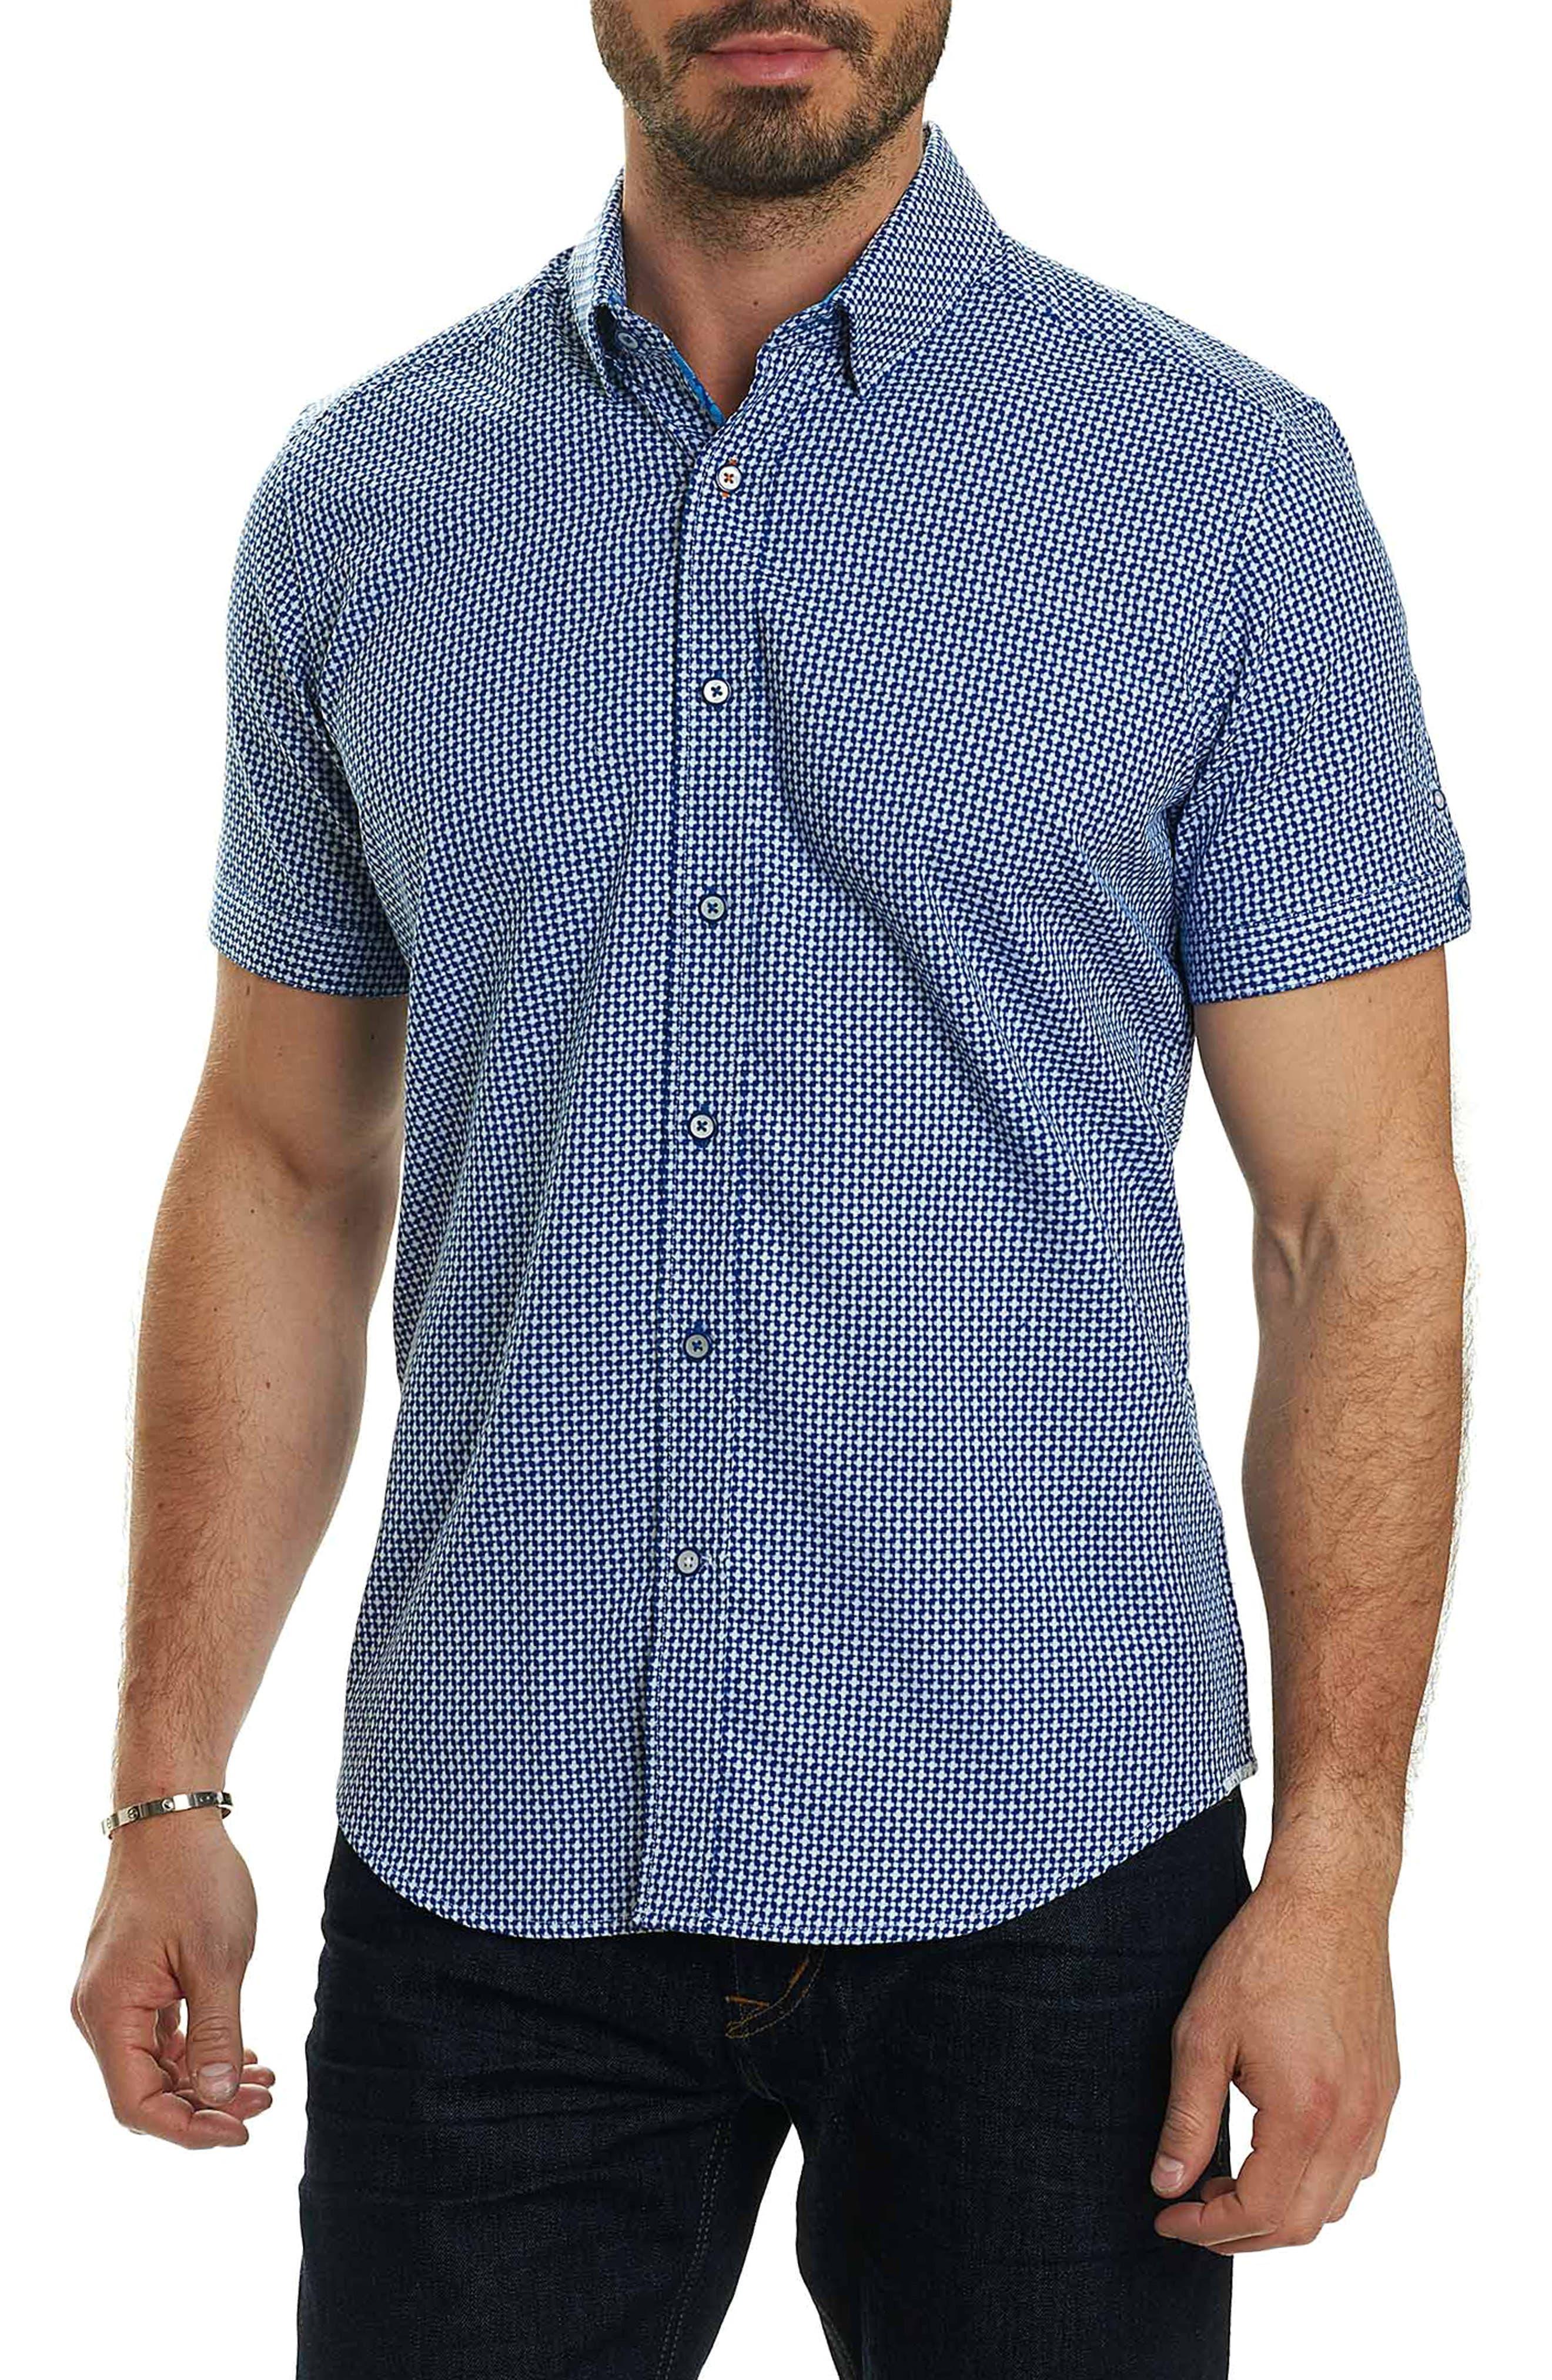 Nikko Tailored Fit Print Sport Shirt,                         Main,                         color, Navy